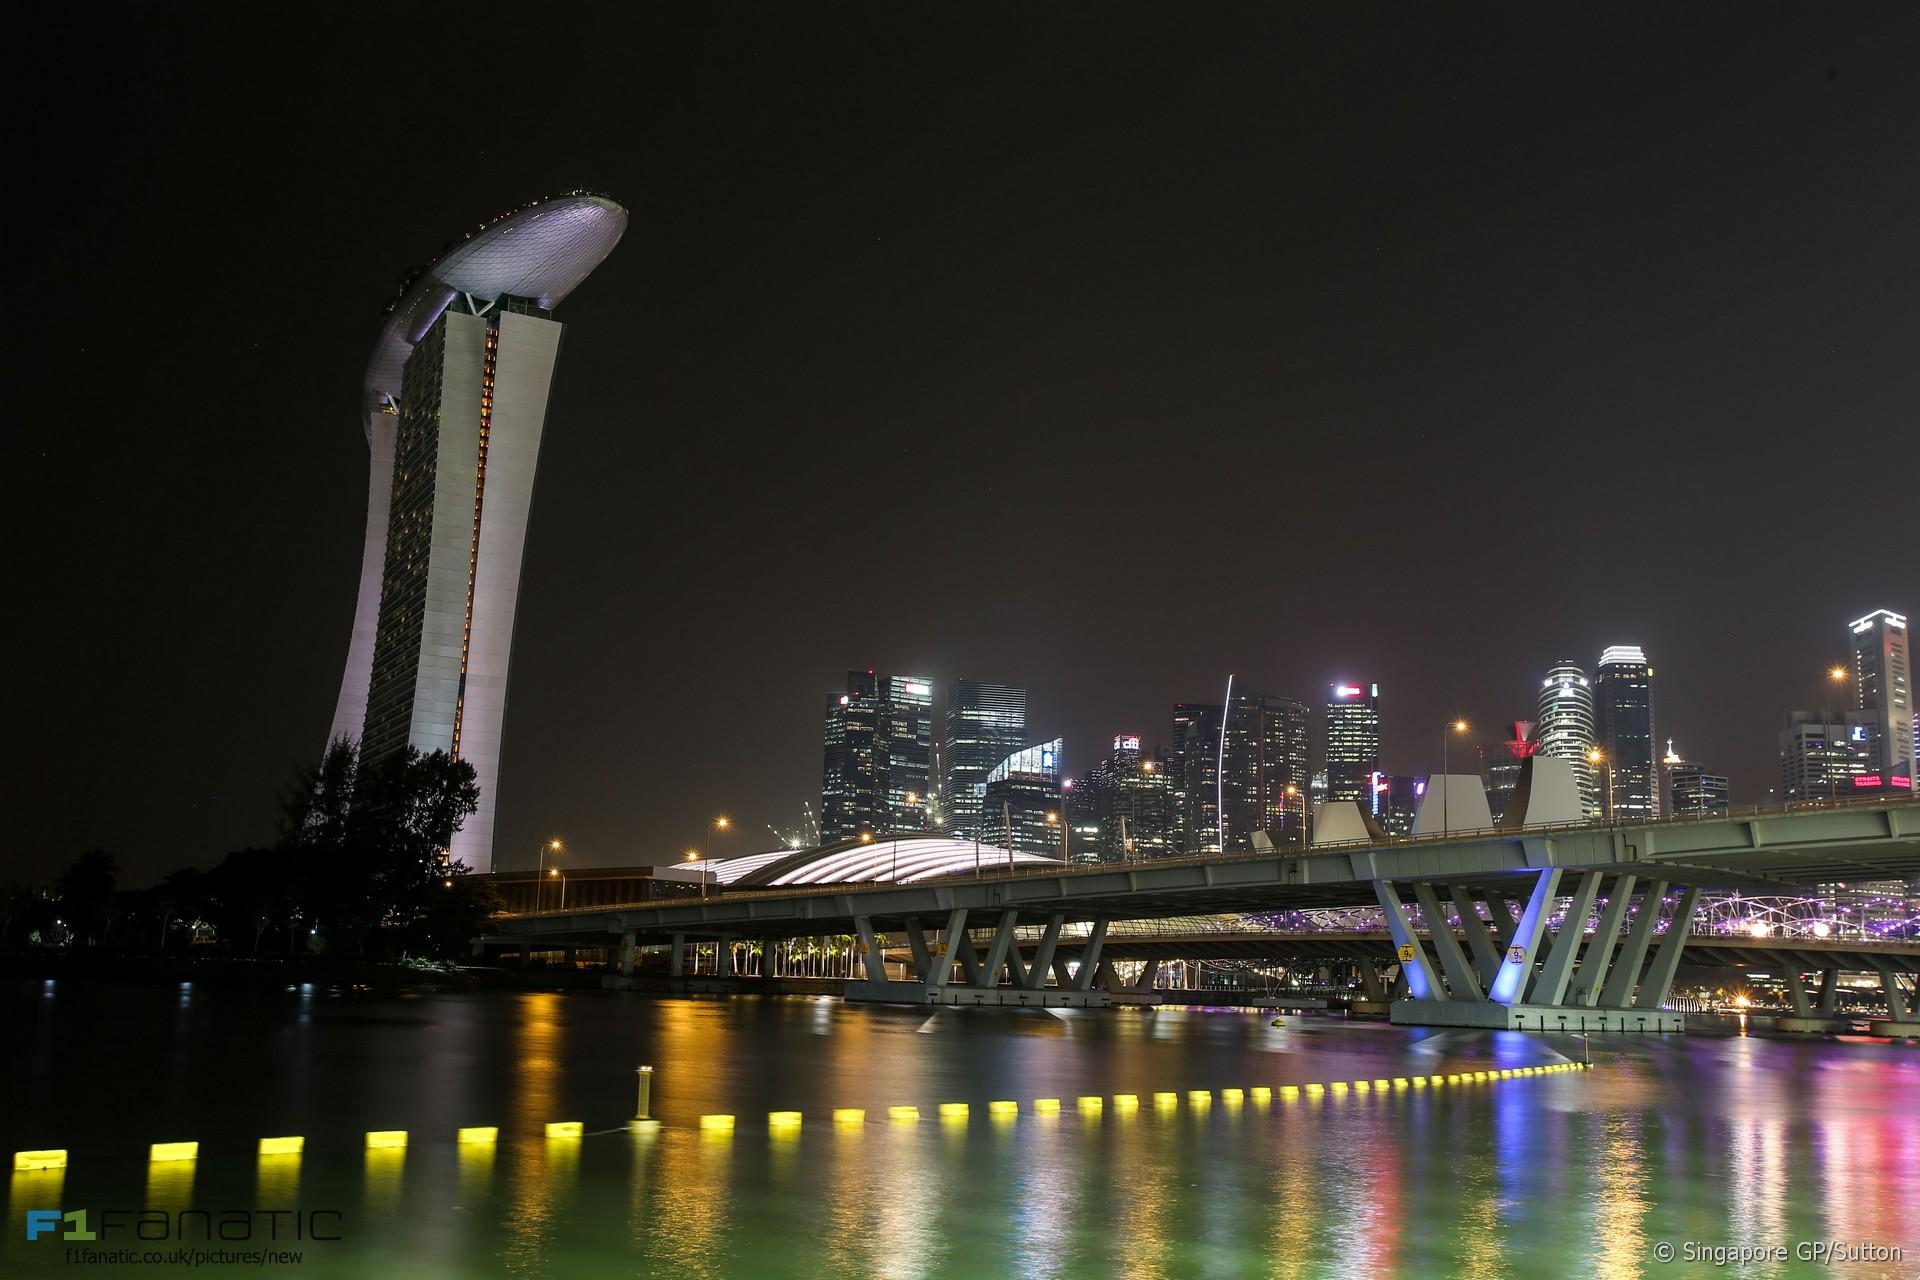 Singapore, 2015